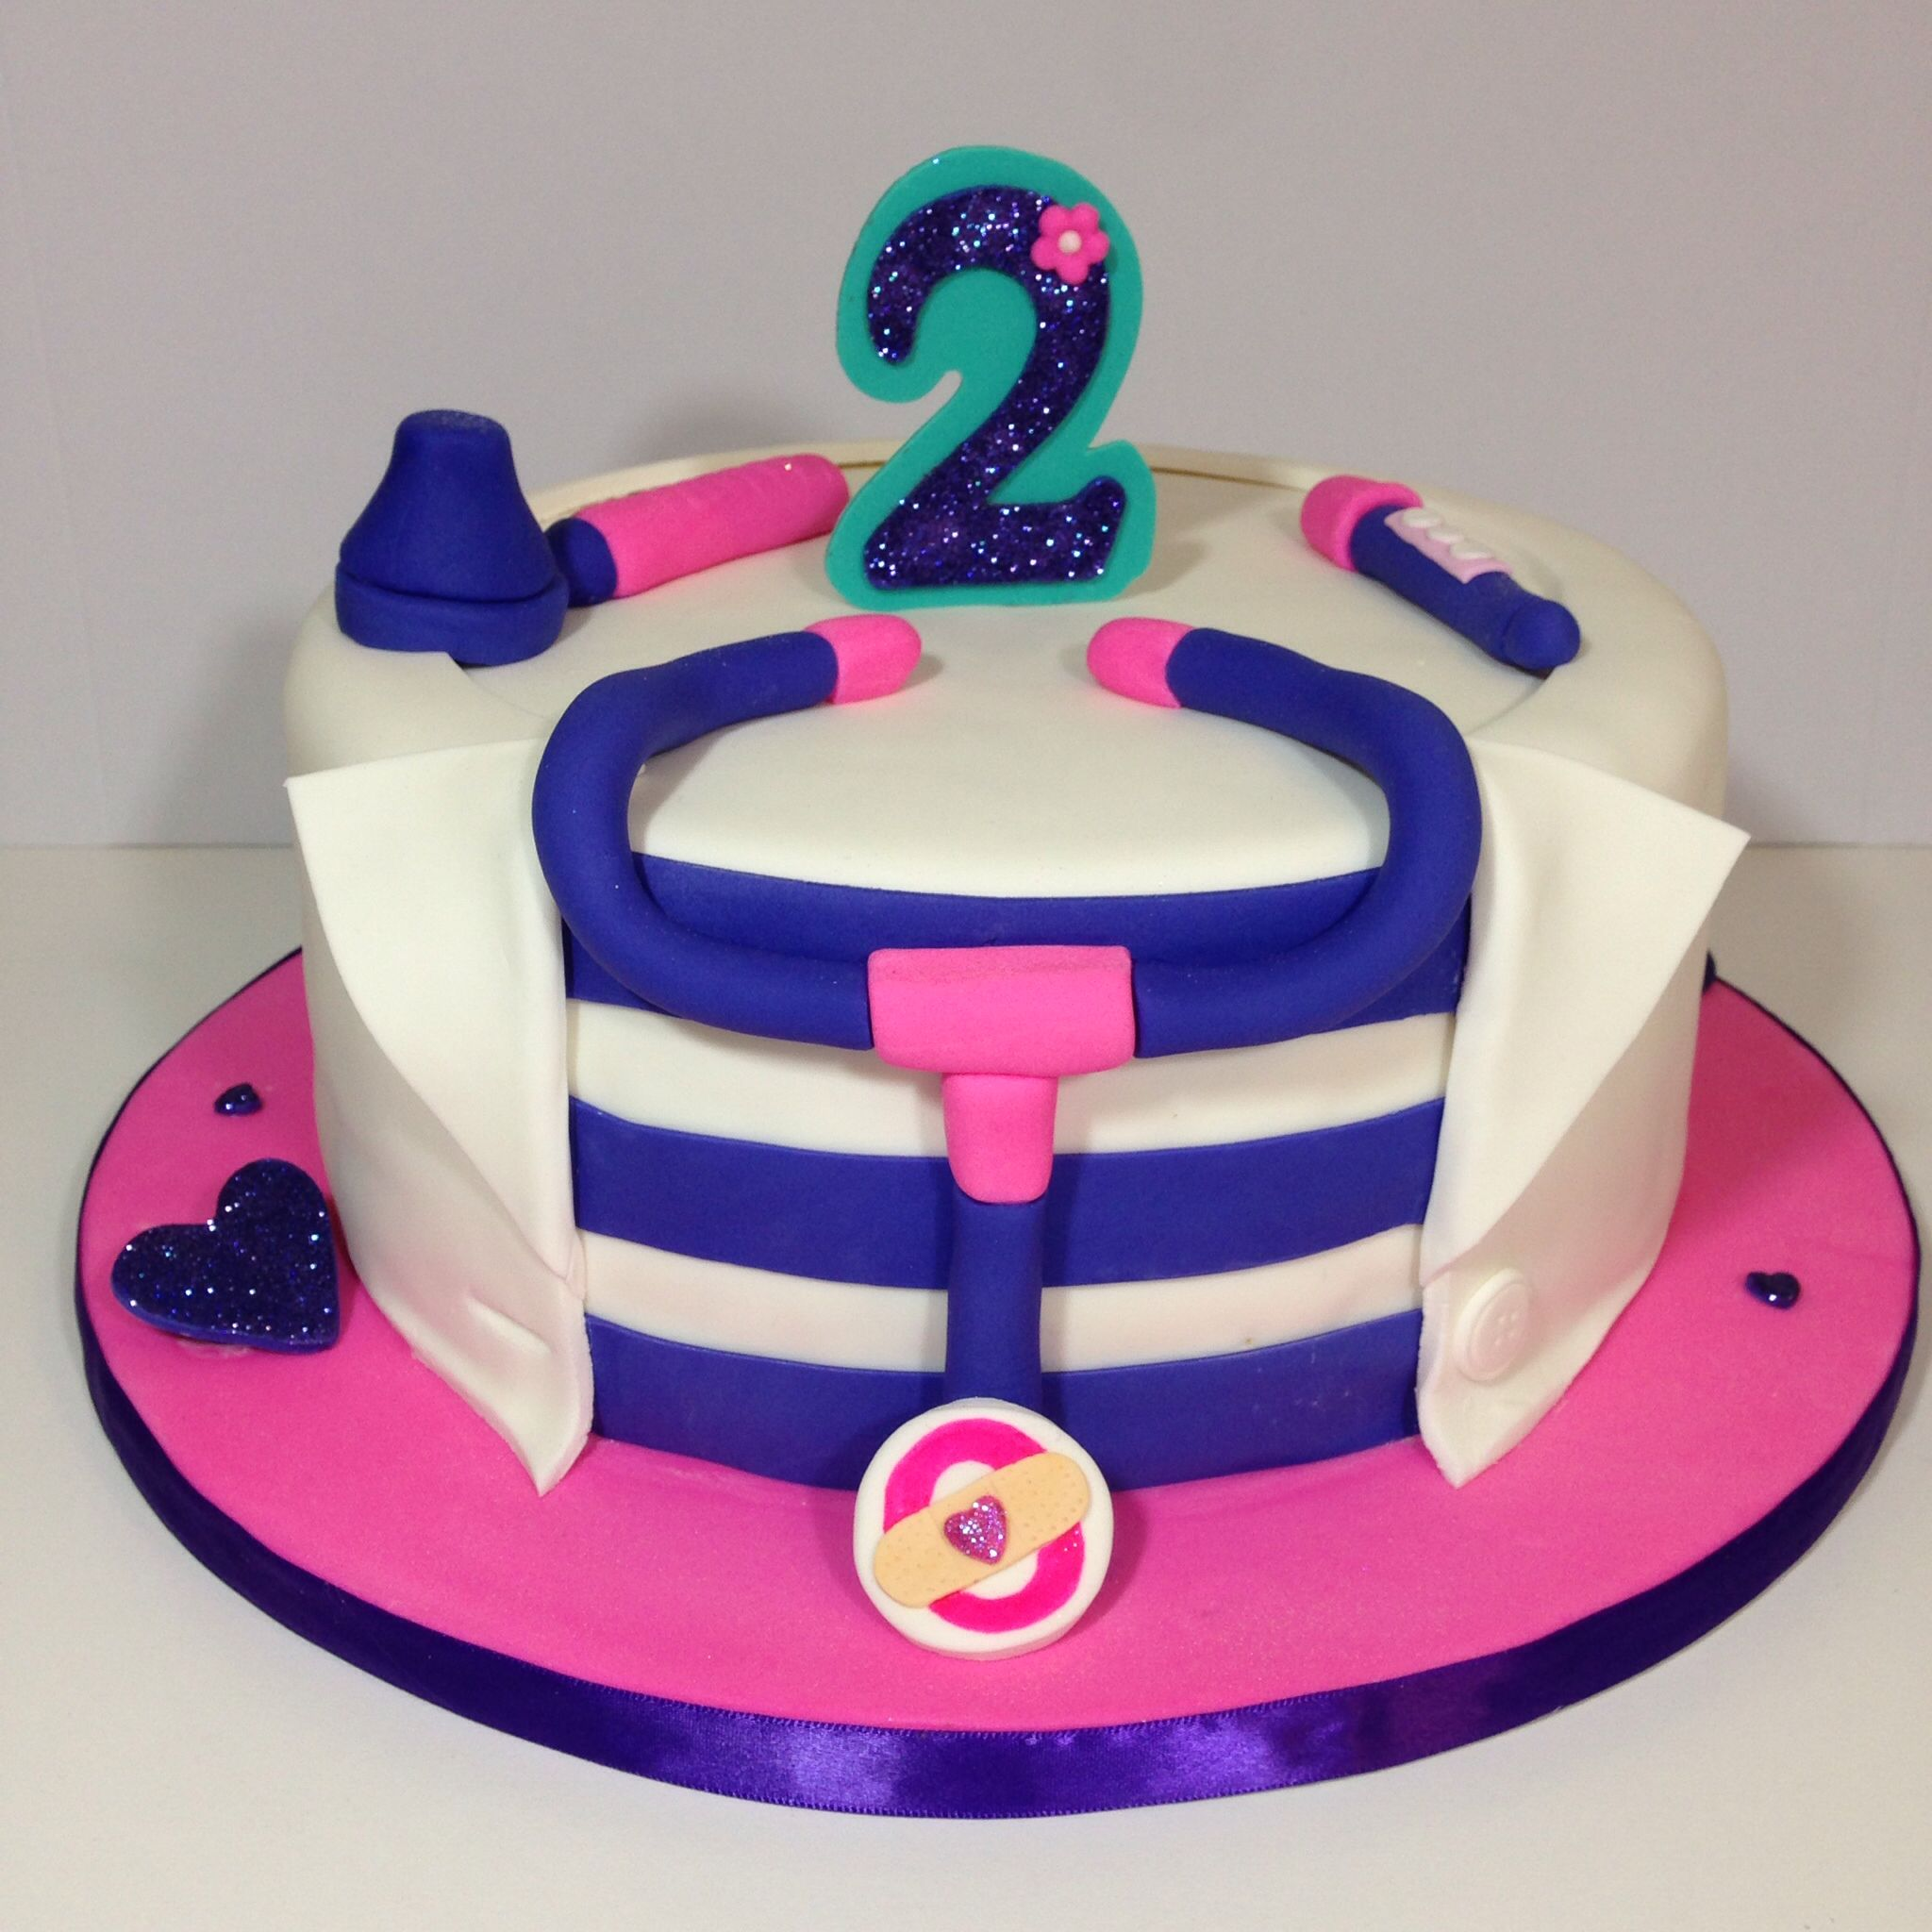 Fabulous Doc Mcstuffins Cake Doc Mcstuffins Cake Doc Mcstuffins Birthday Funny Birthday Cards Online Inifodamsfinfo